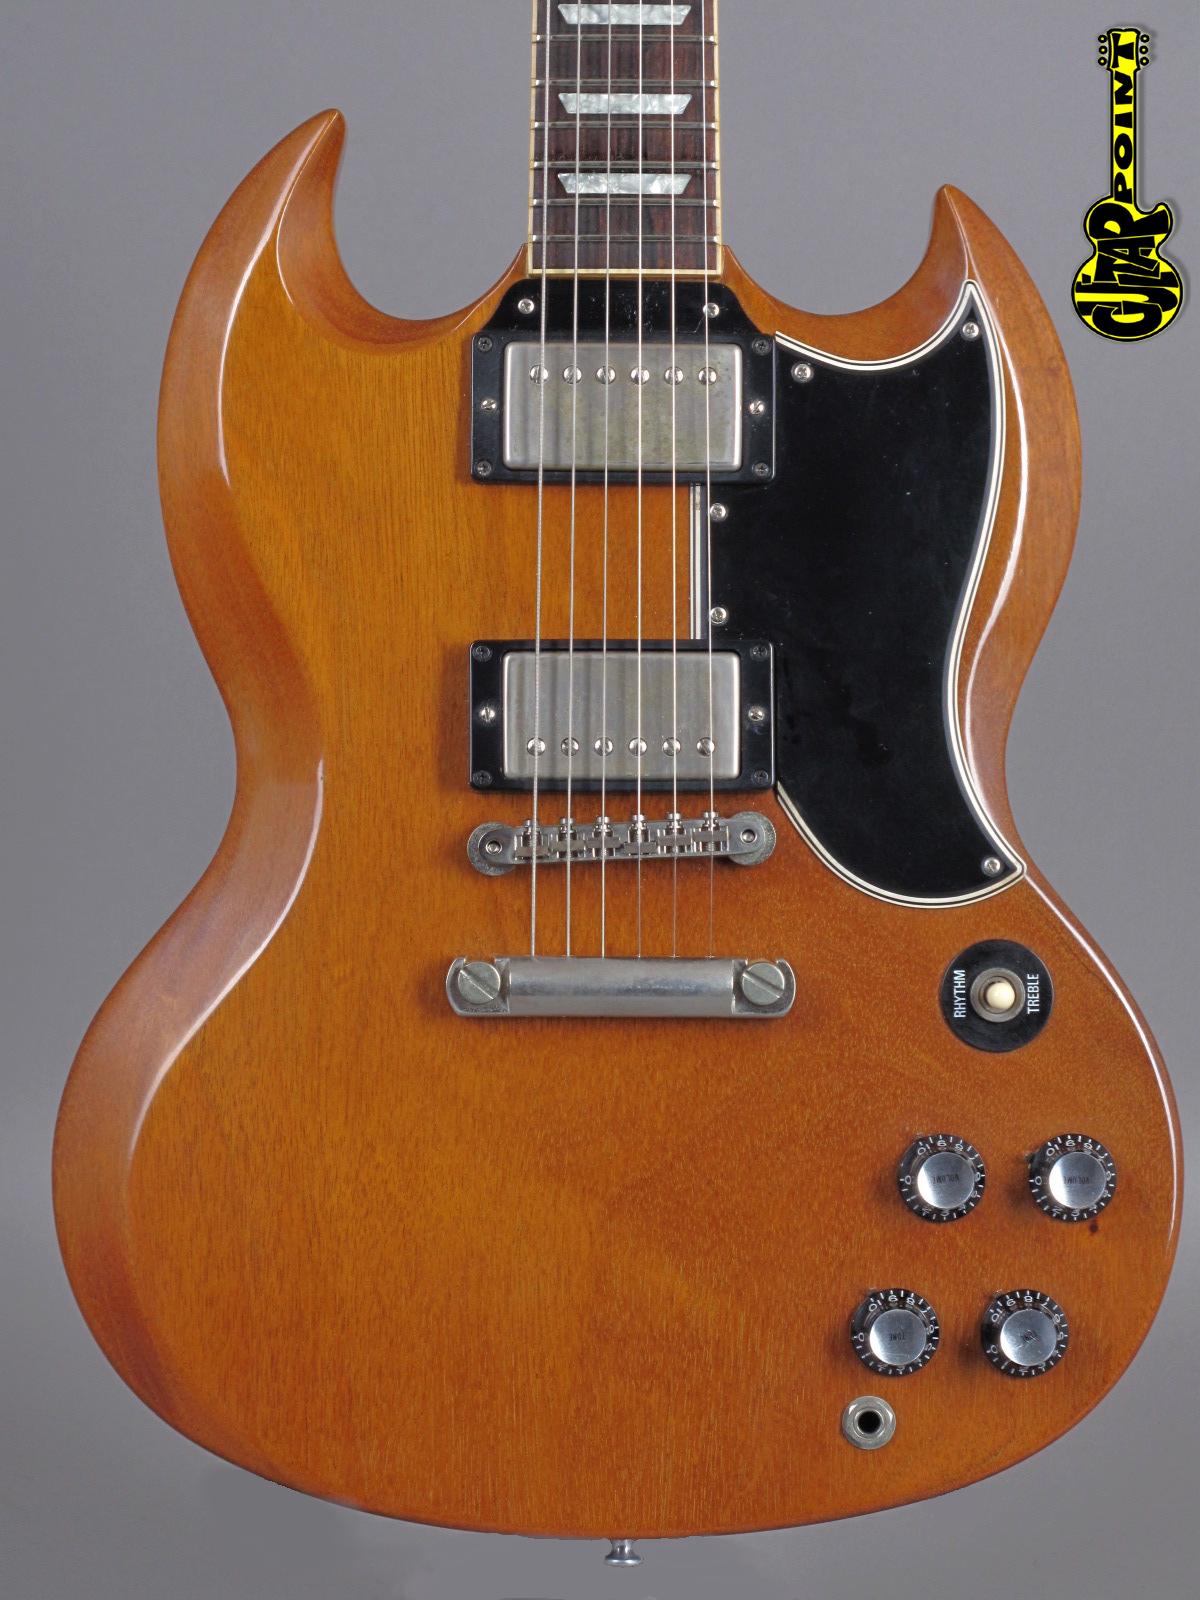 2001 Gibson Custom Shop SG '61 Reissue Faded Cherry